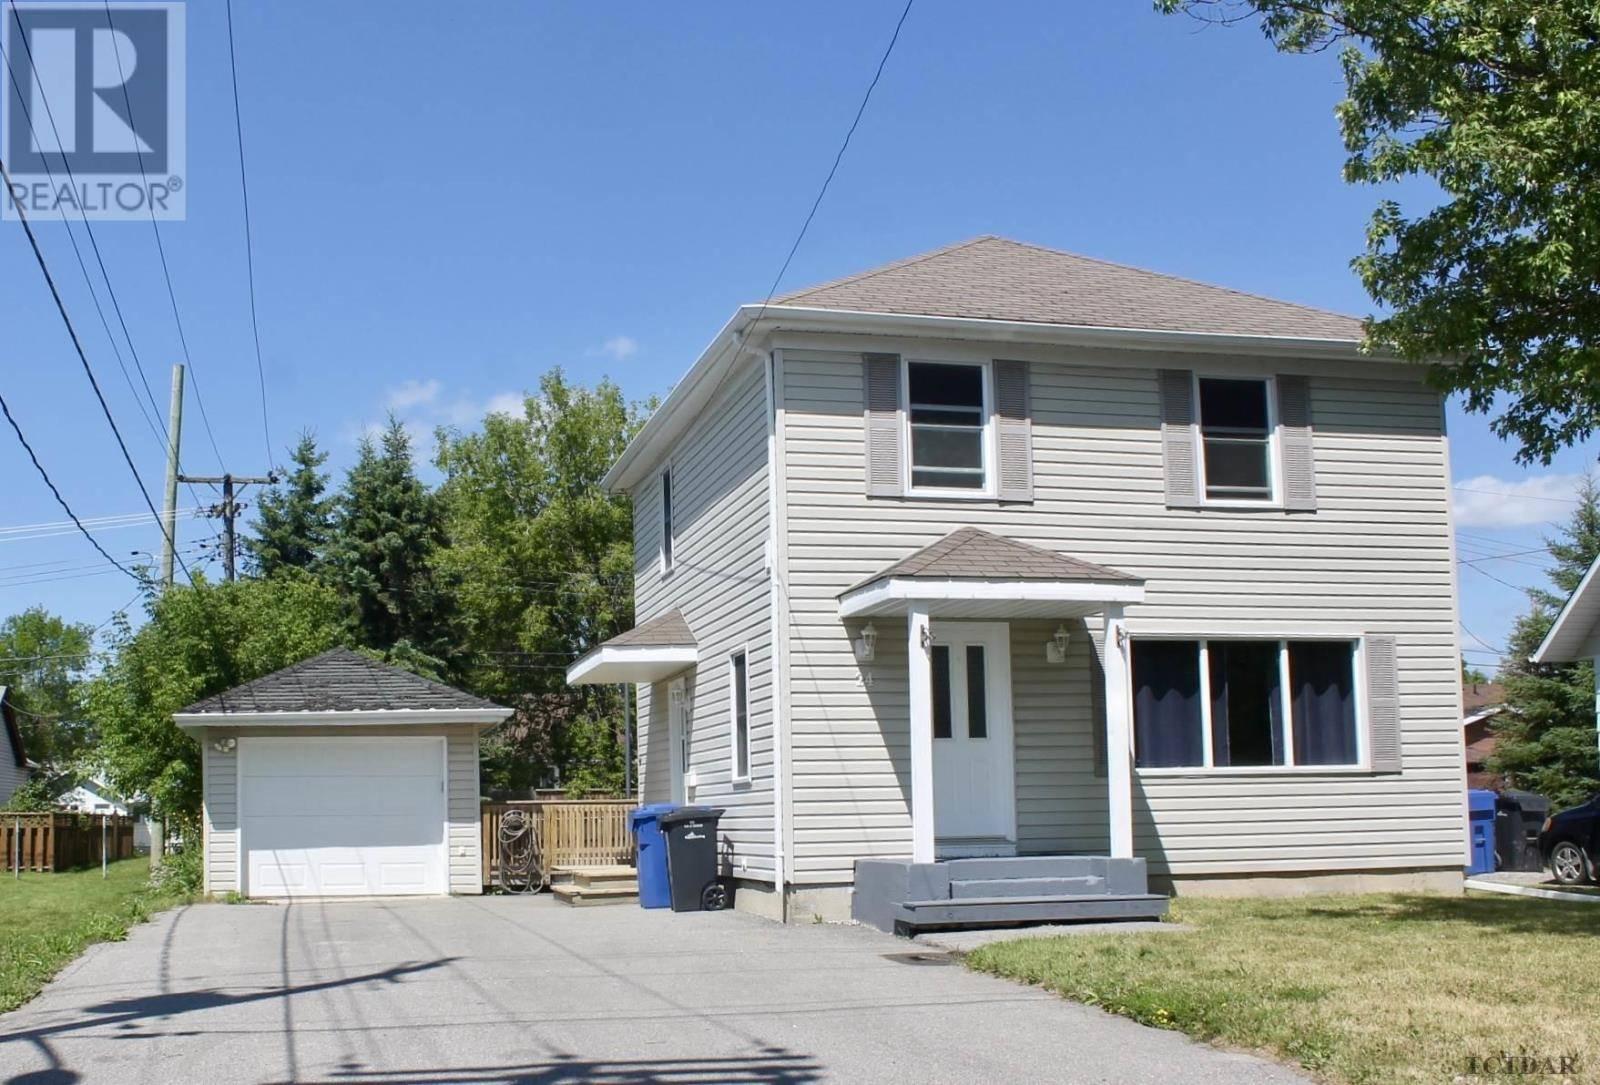 House for sale at 24 Spruce St Kapuskasing Ontario - MLS: TM200209